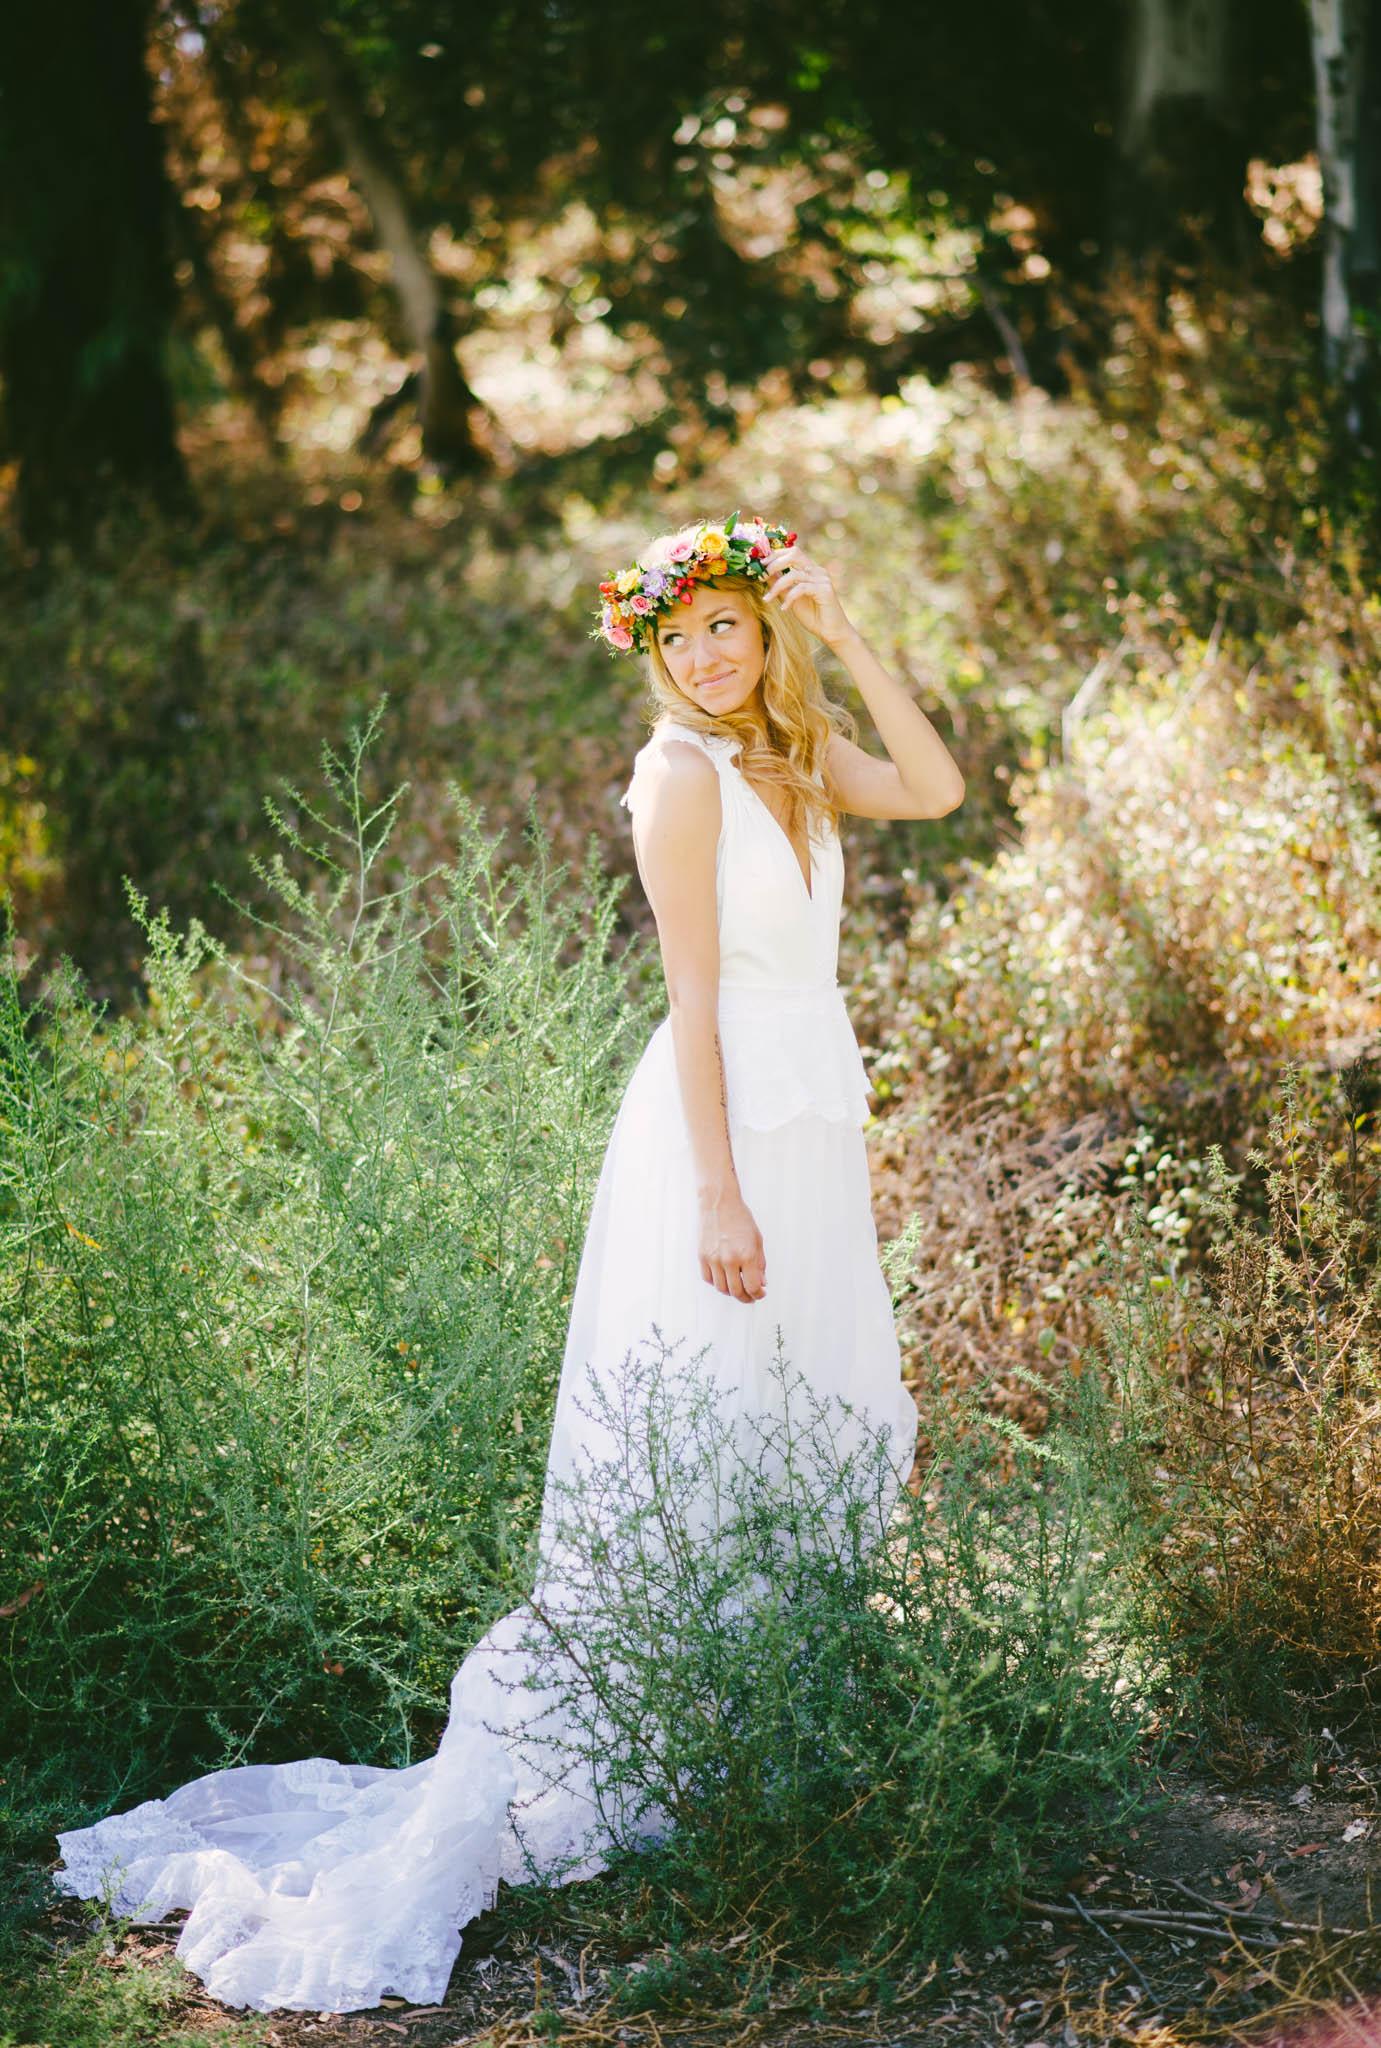 ©Isaiah & Taylor Photography - Los Angeles Wedding Photographer - Mexican Bohemian Wedding, Laguna Niguel Regional Park, Orange County-7.jpg